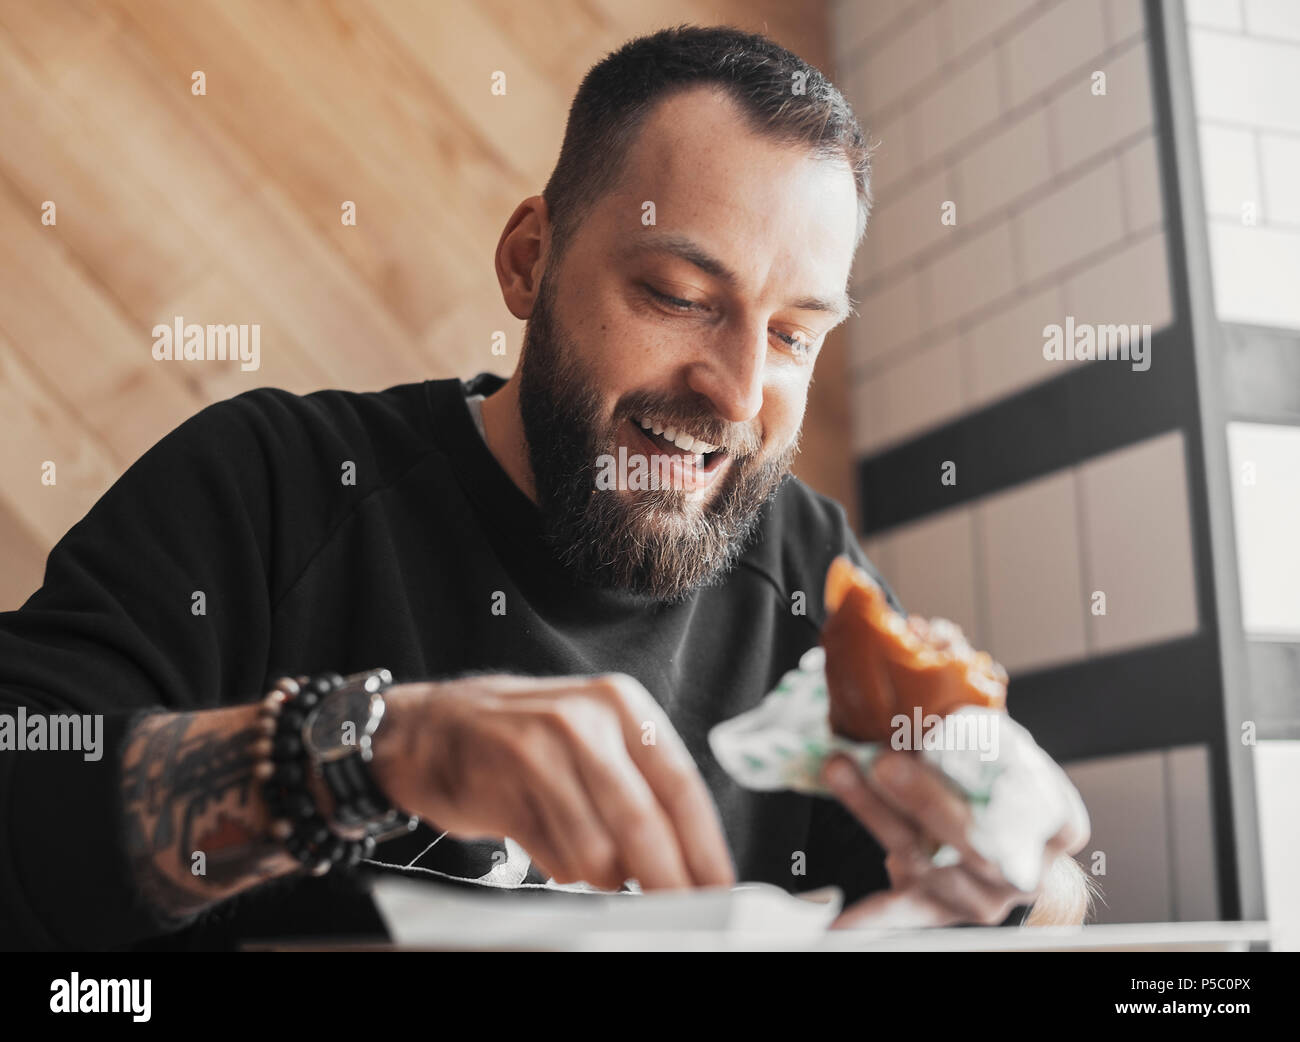 Junger bärtiger Mann essen Burger und lächelnd. Stockbild